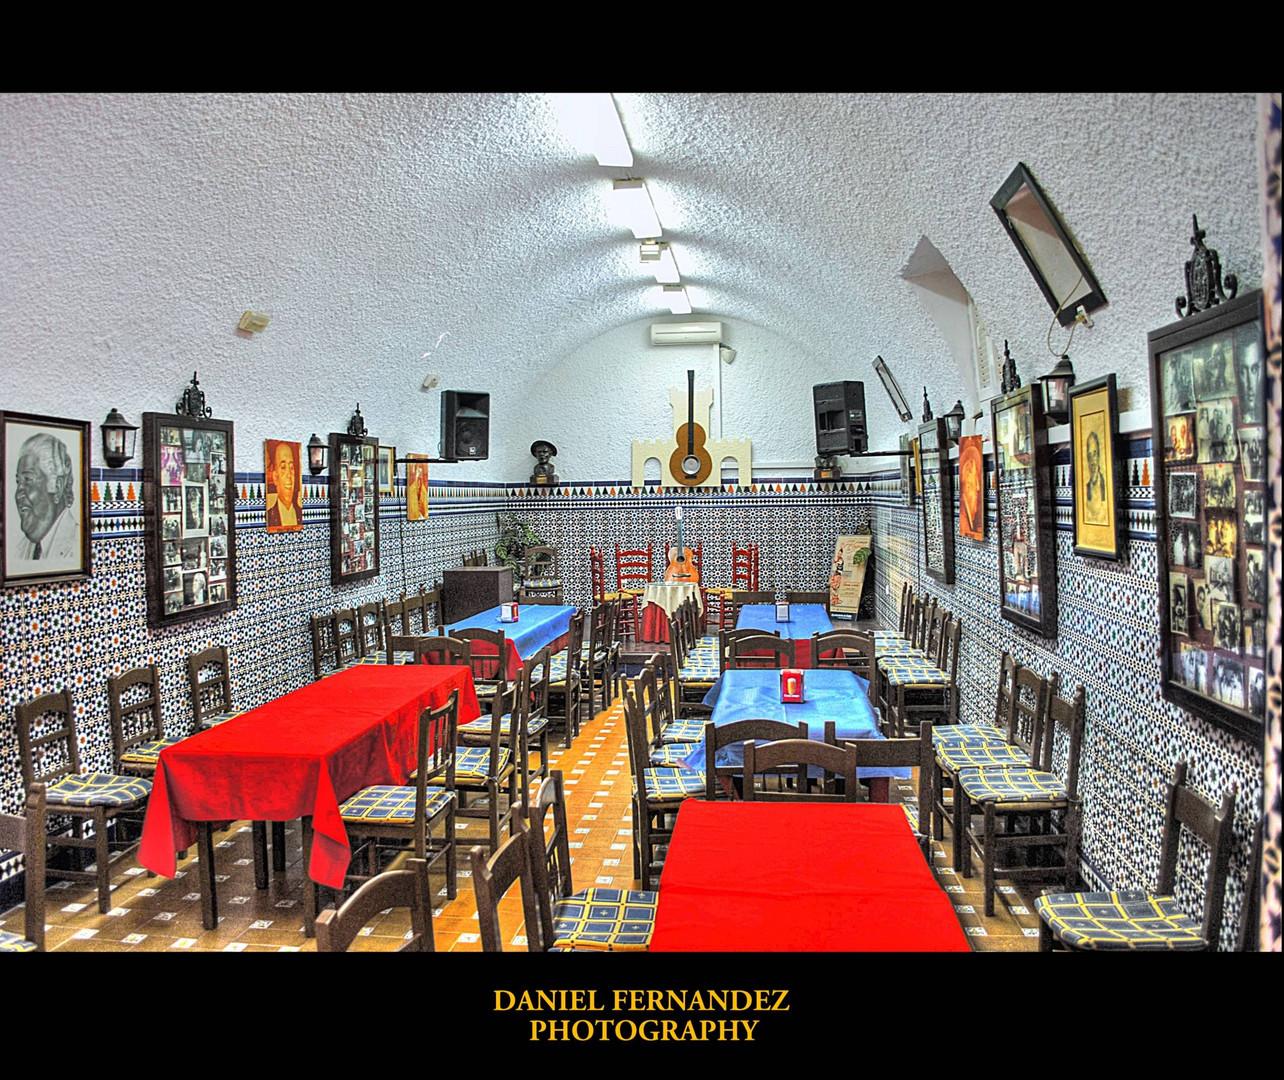 Sala flamenca (Cadiz)